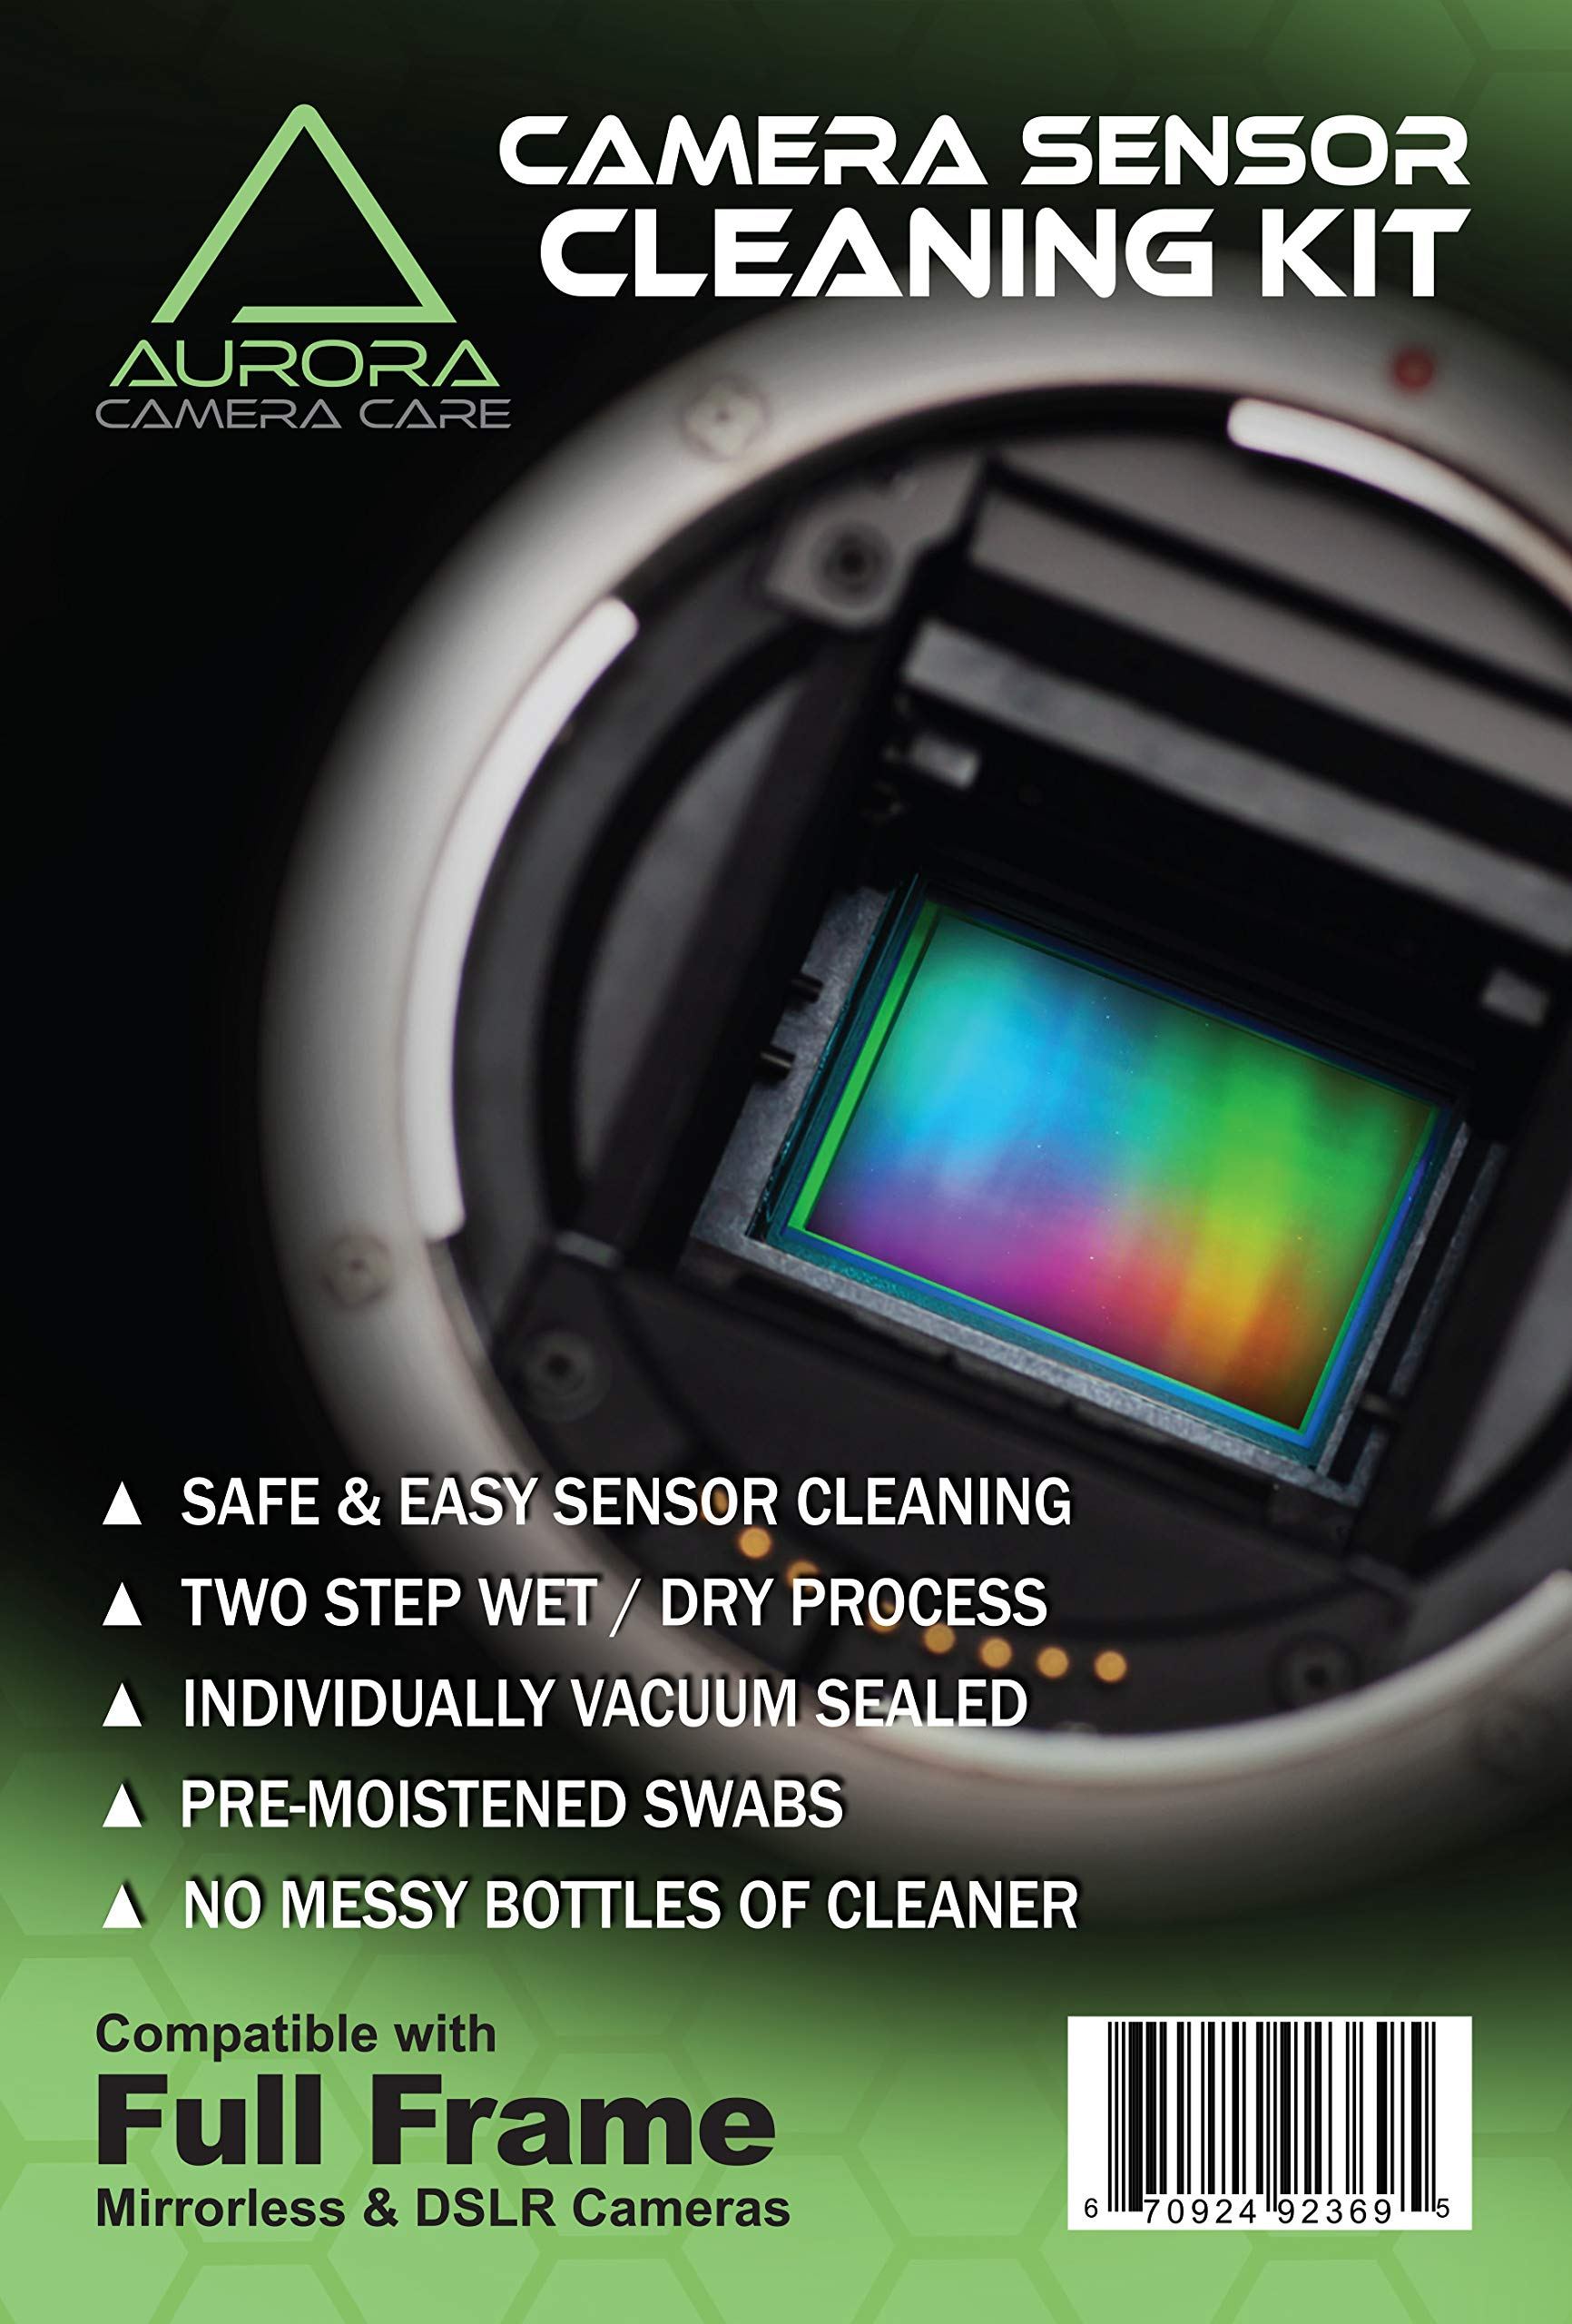 Aurora Camera Care Camera Sensor Cleaning Kits (Full Frame)